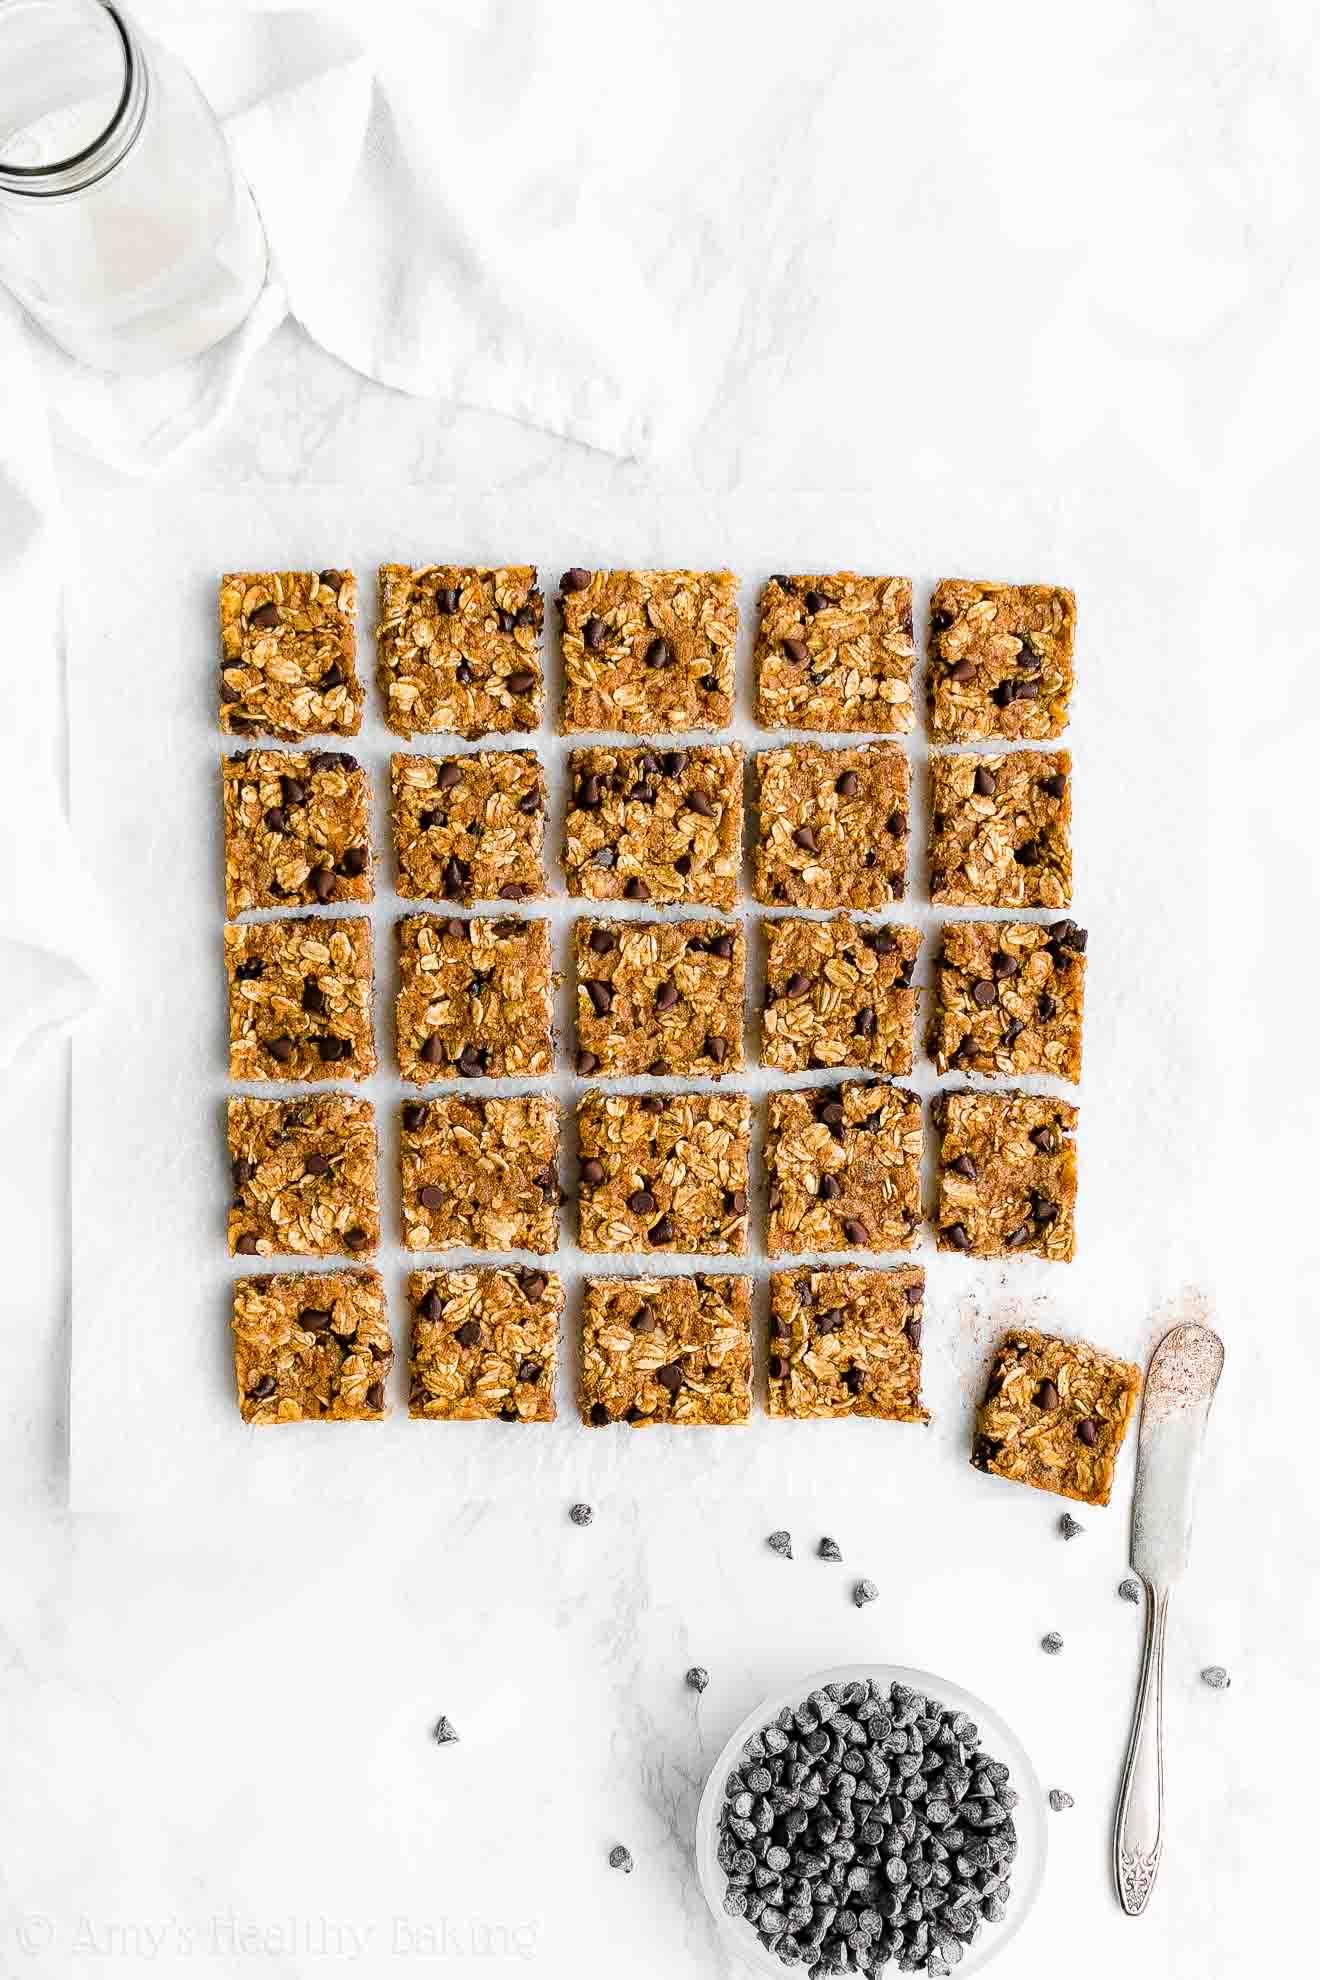 Healthy Low Calorie Low Fat Pumpkin Chocolate Chip Granola Bar Bites